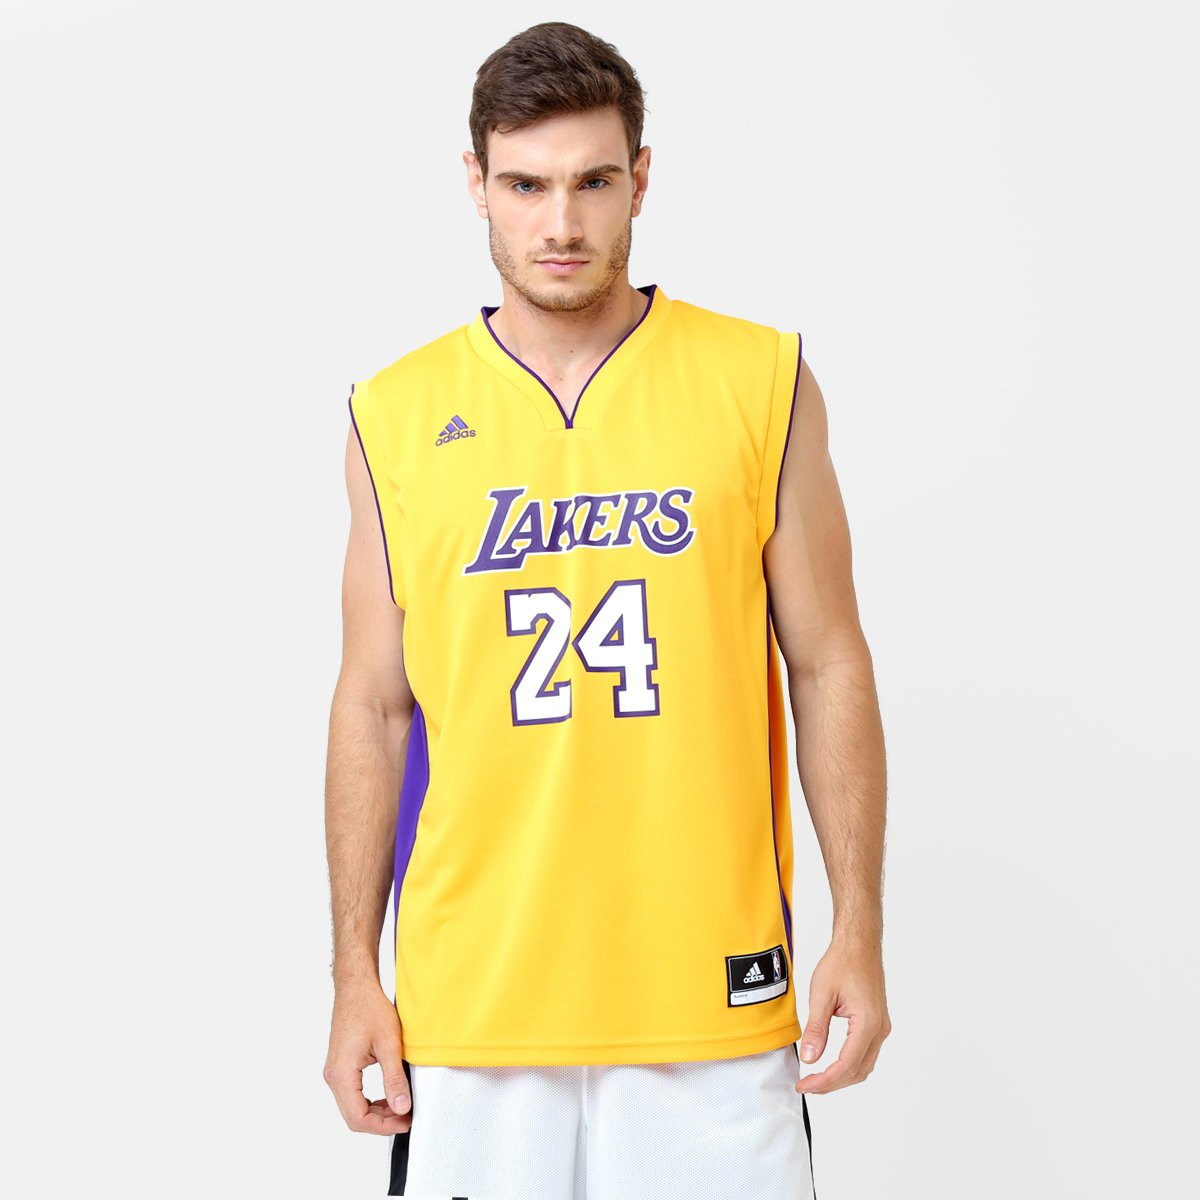 Camiseta Regata NBA Adidas Los Angeles Lakers Home - Bryant - Compre Agora   b73484a4f2d